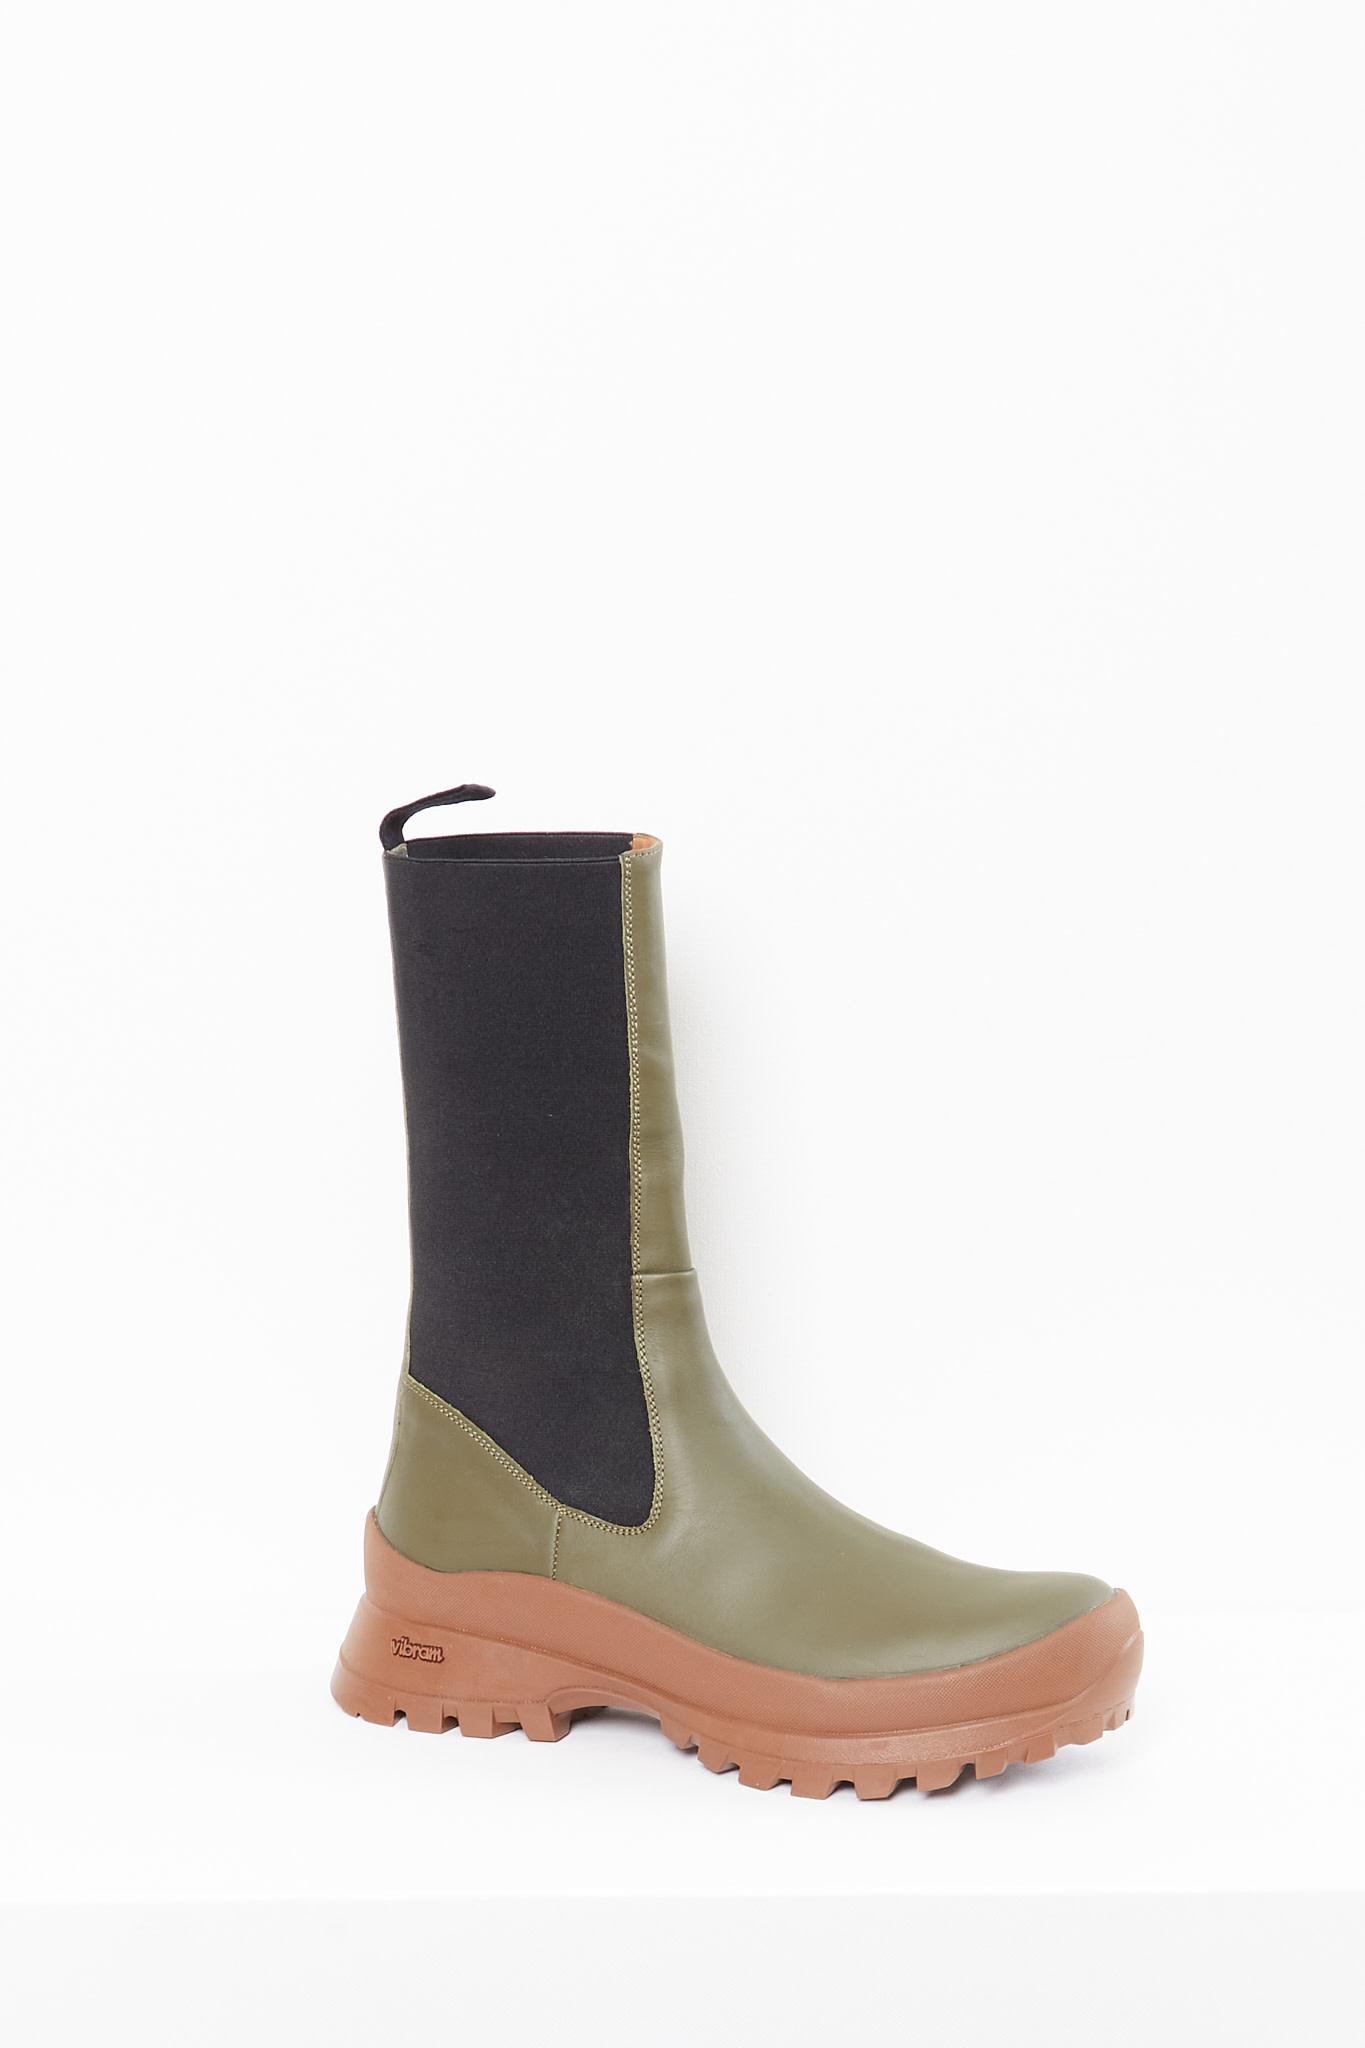 atp Tolentino boots